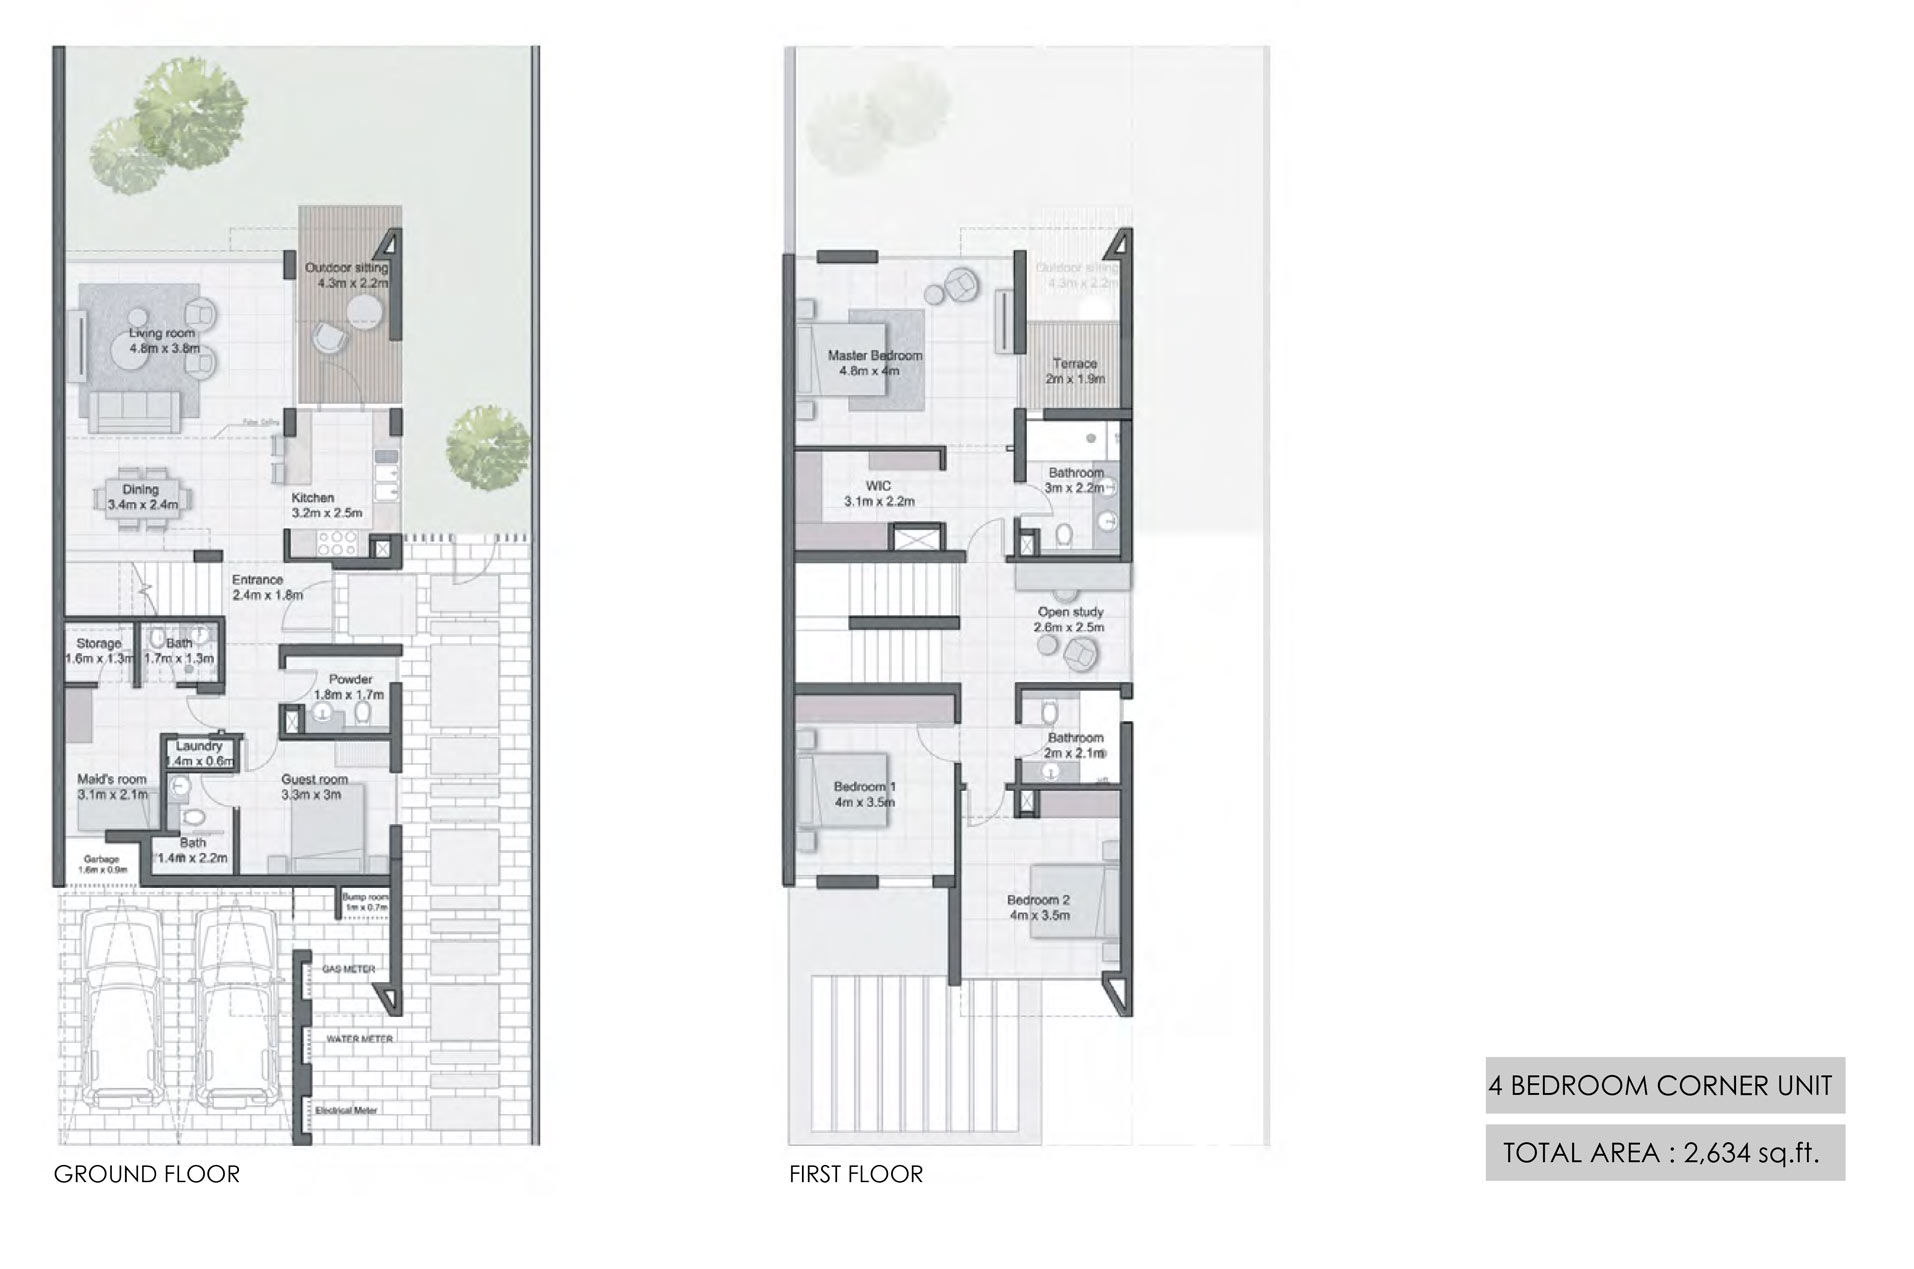 4 Bedroom Corner Unit Size 2634  sq. ft.